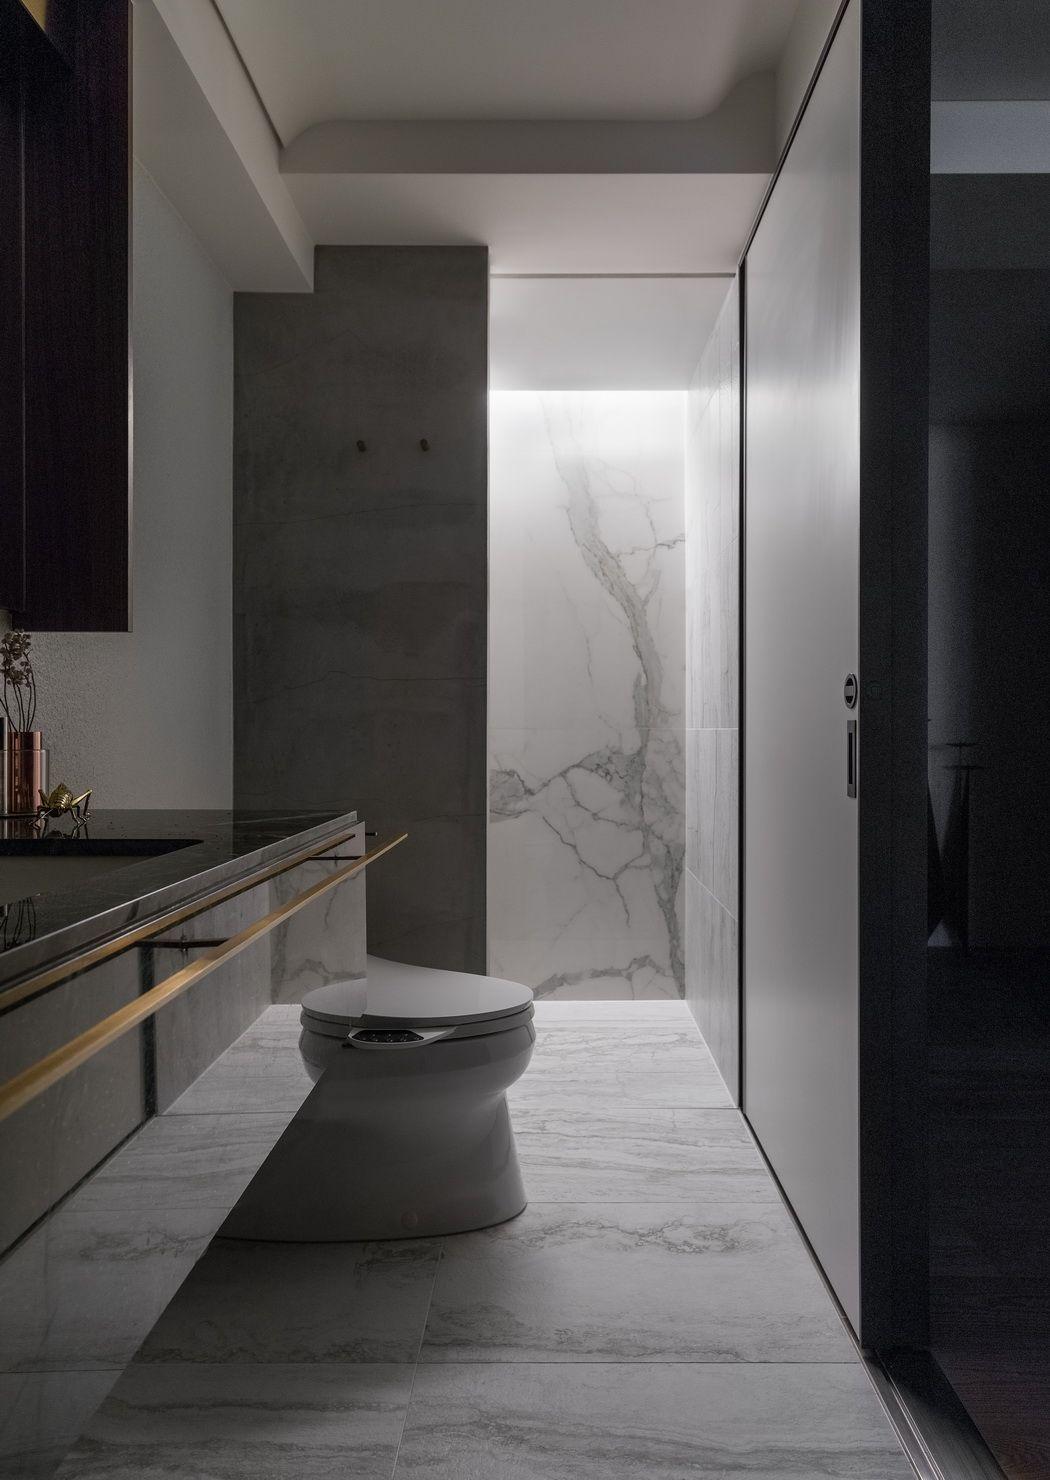 Carrelage Salle De Bain Giovanni ~ 13 jpg marblebathrooms home pinterest baies salle de bains